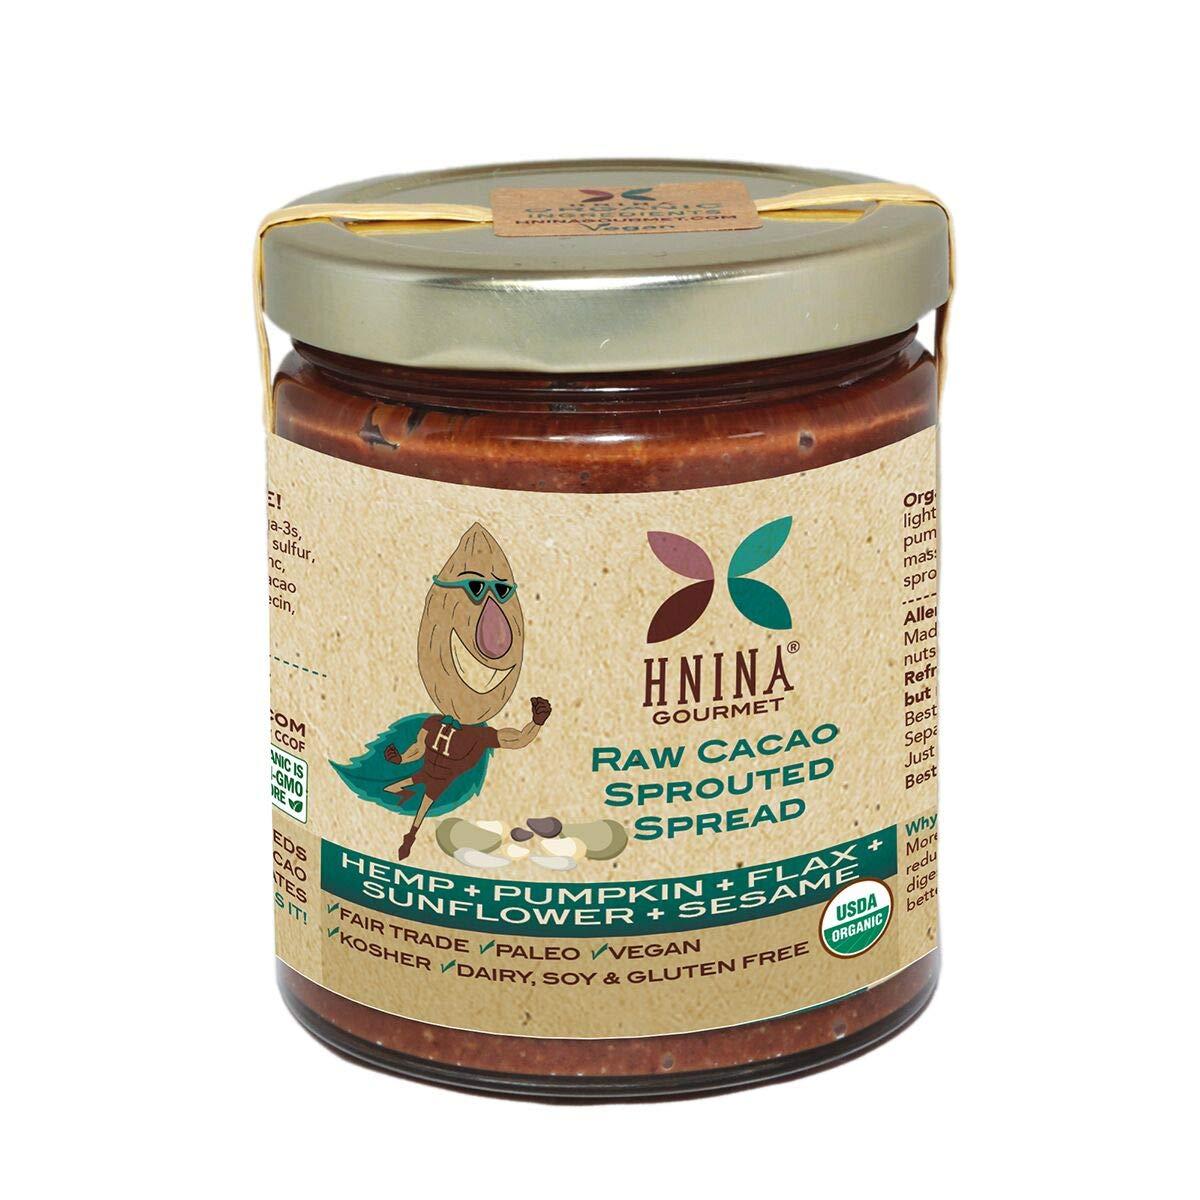 HNINA Gourmet Organic Sprouted Seeds & Raw Cacao Spread – Hemp + Pumpkin + Flax + Sunflower + Sesame